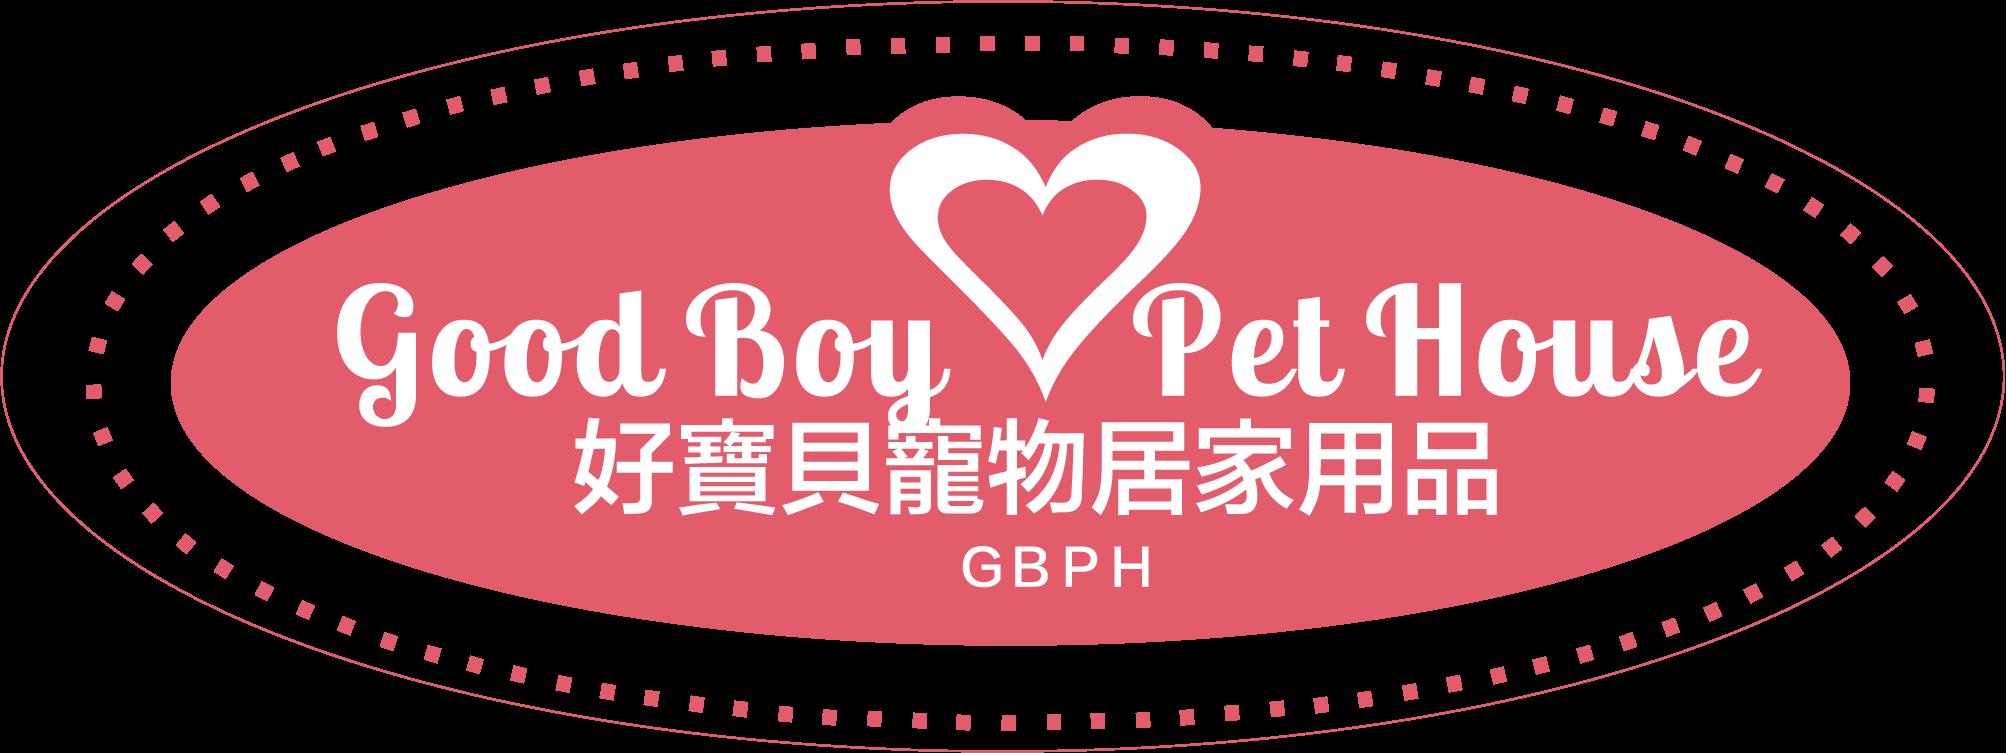 GBPH 好寶貝寵物居家用品